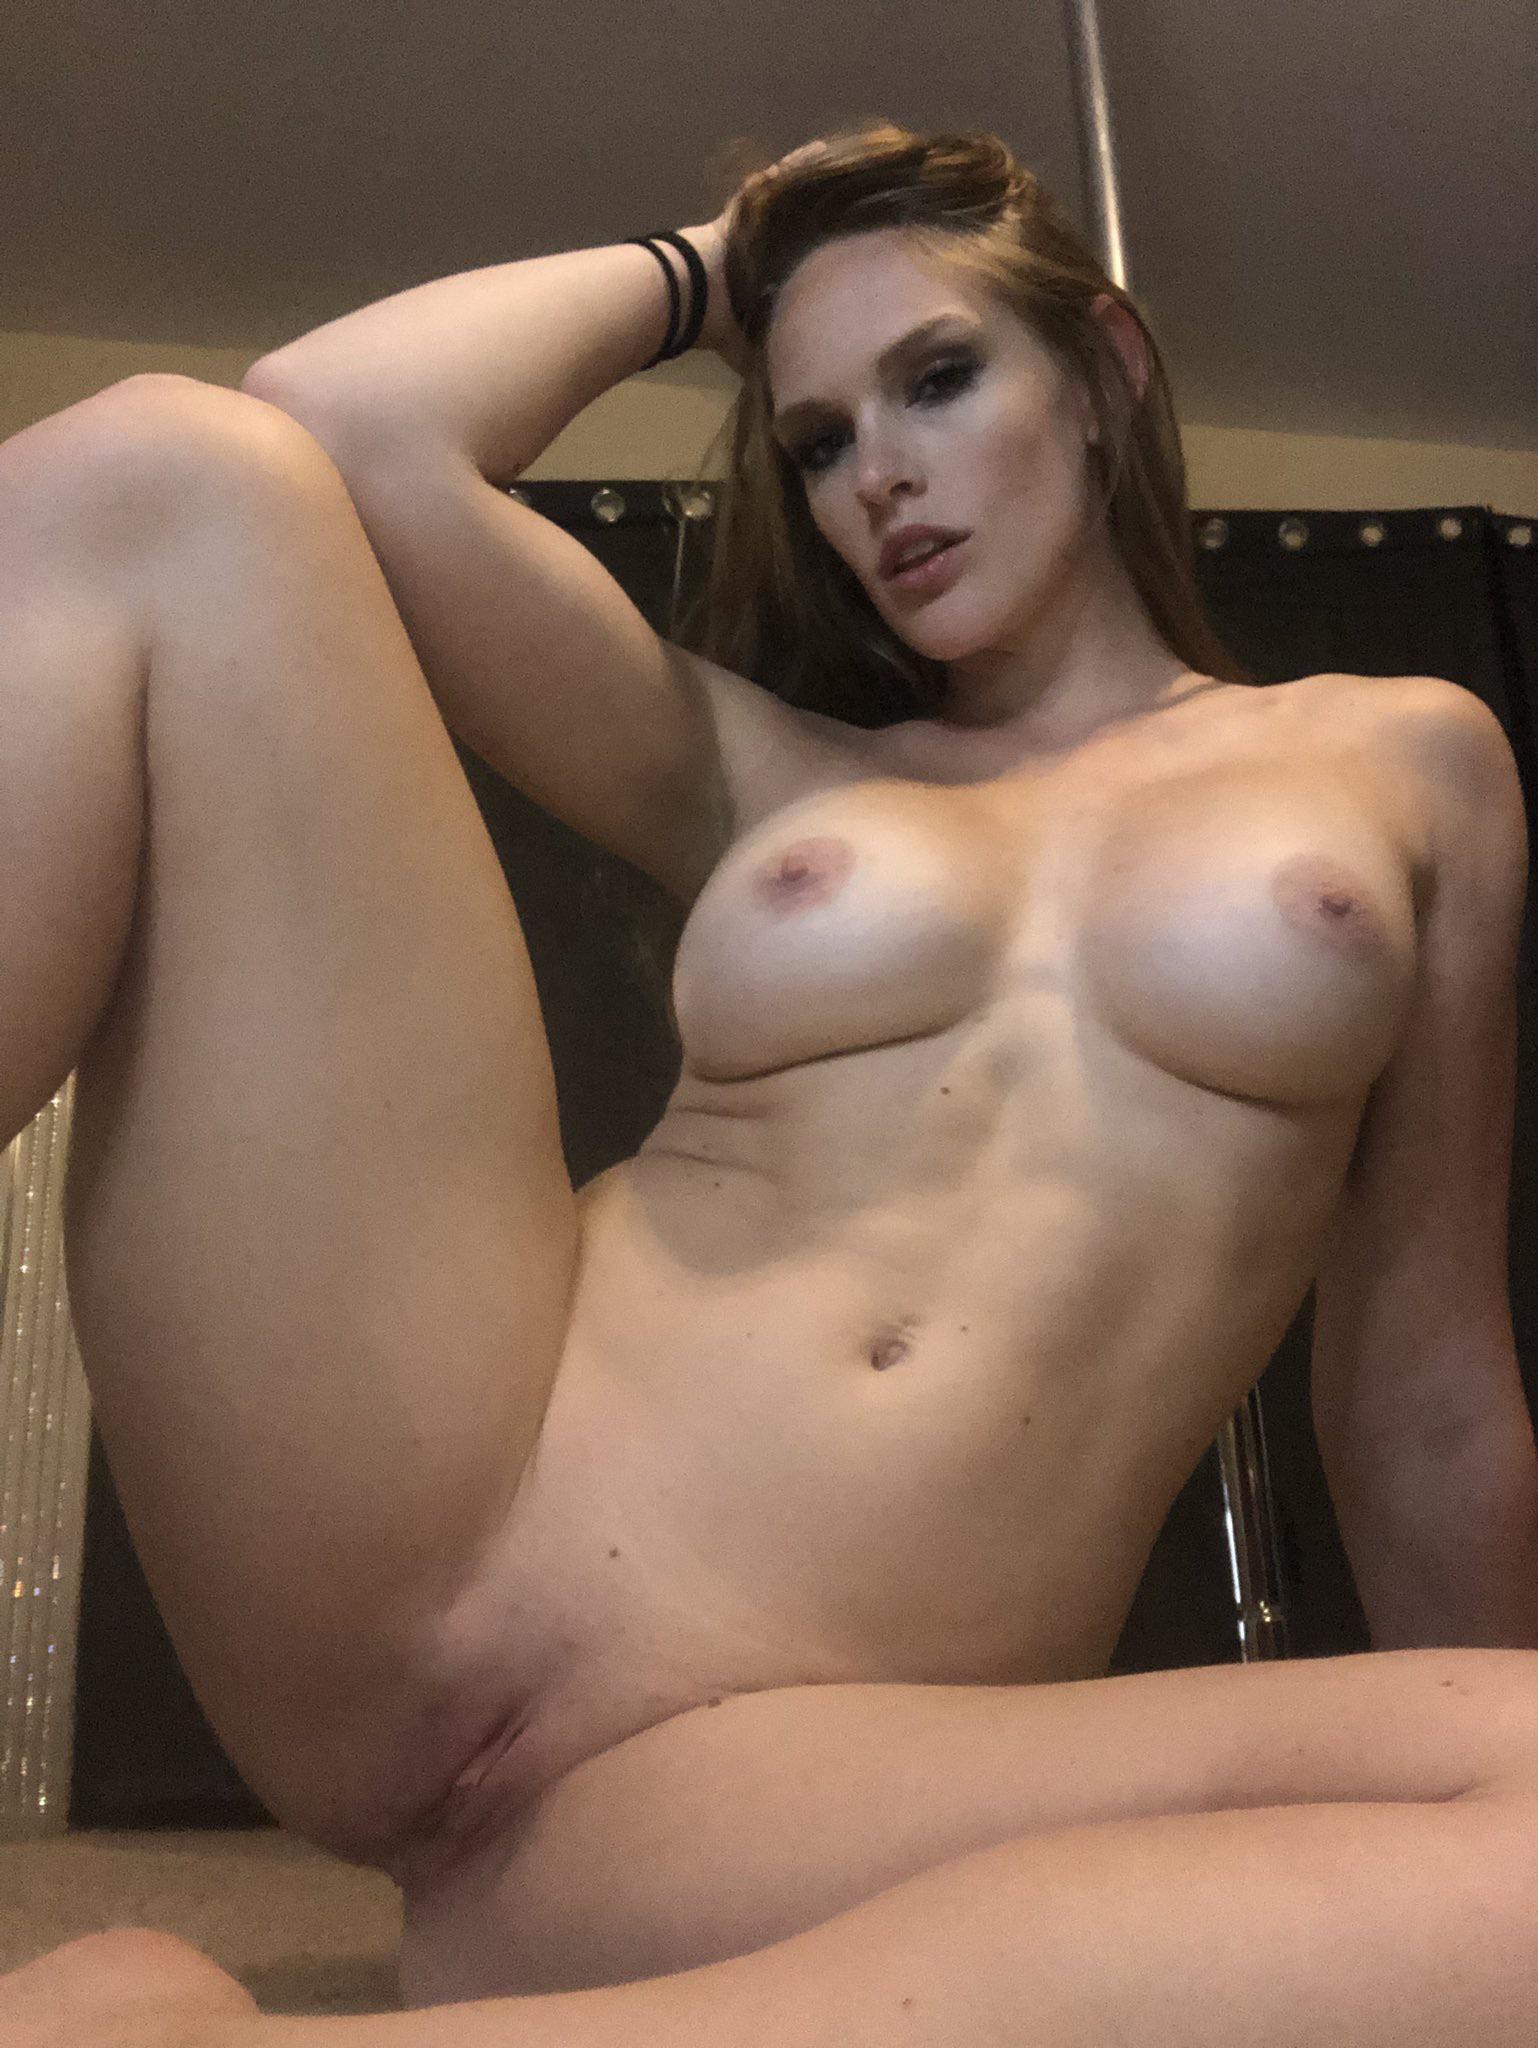 Nice Stripper Pole